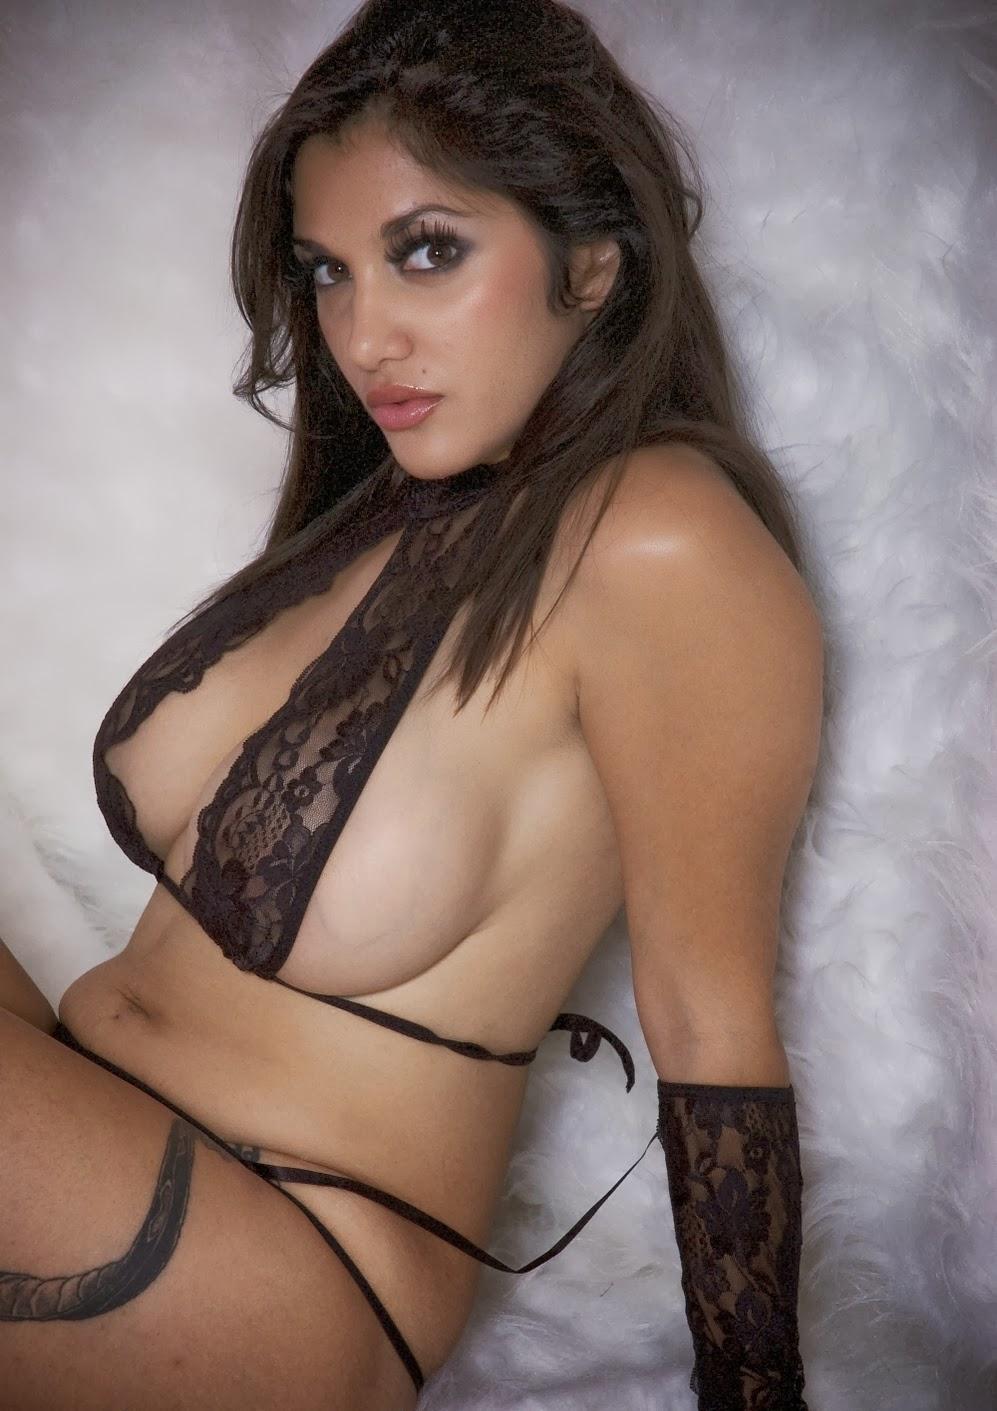 Cute boobs hot bangla girlfriend blowjob n fuck video 3